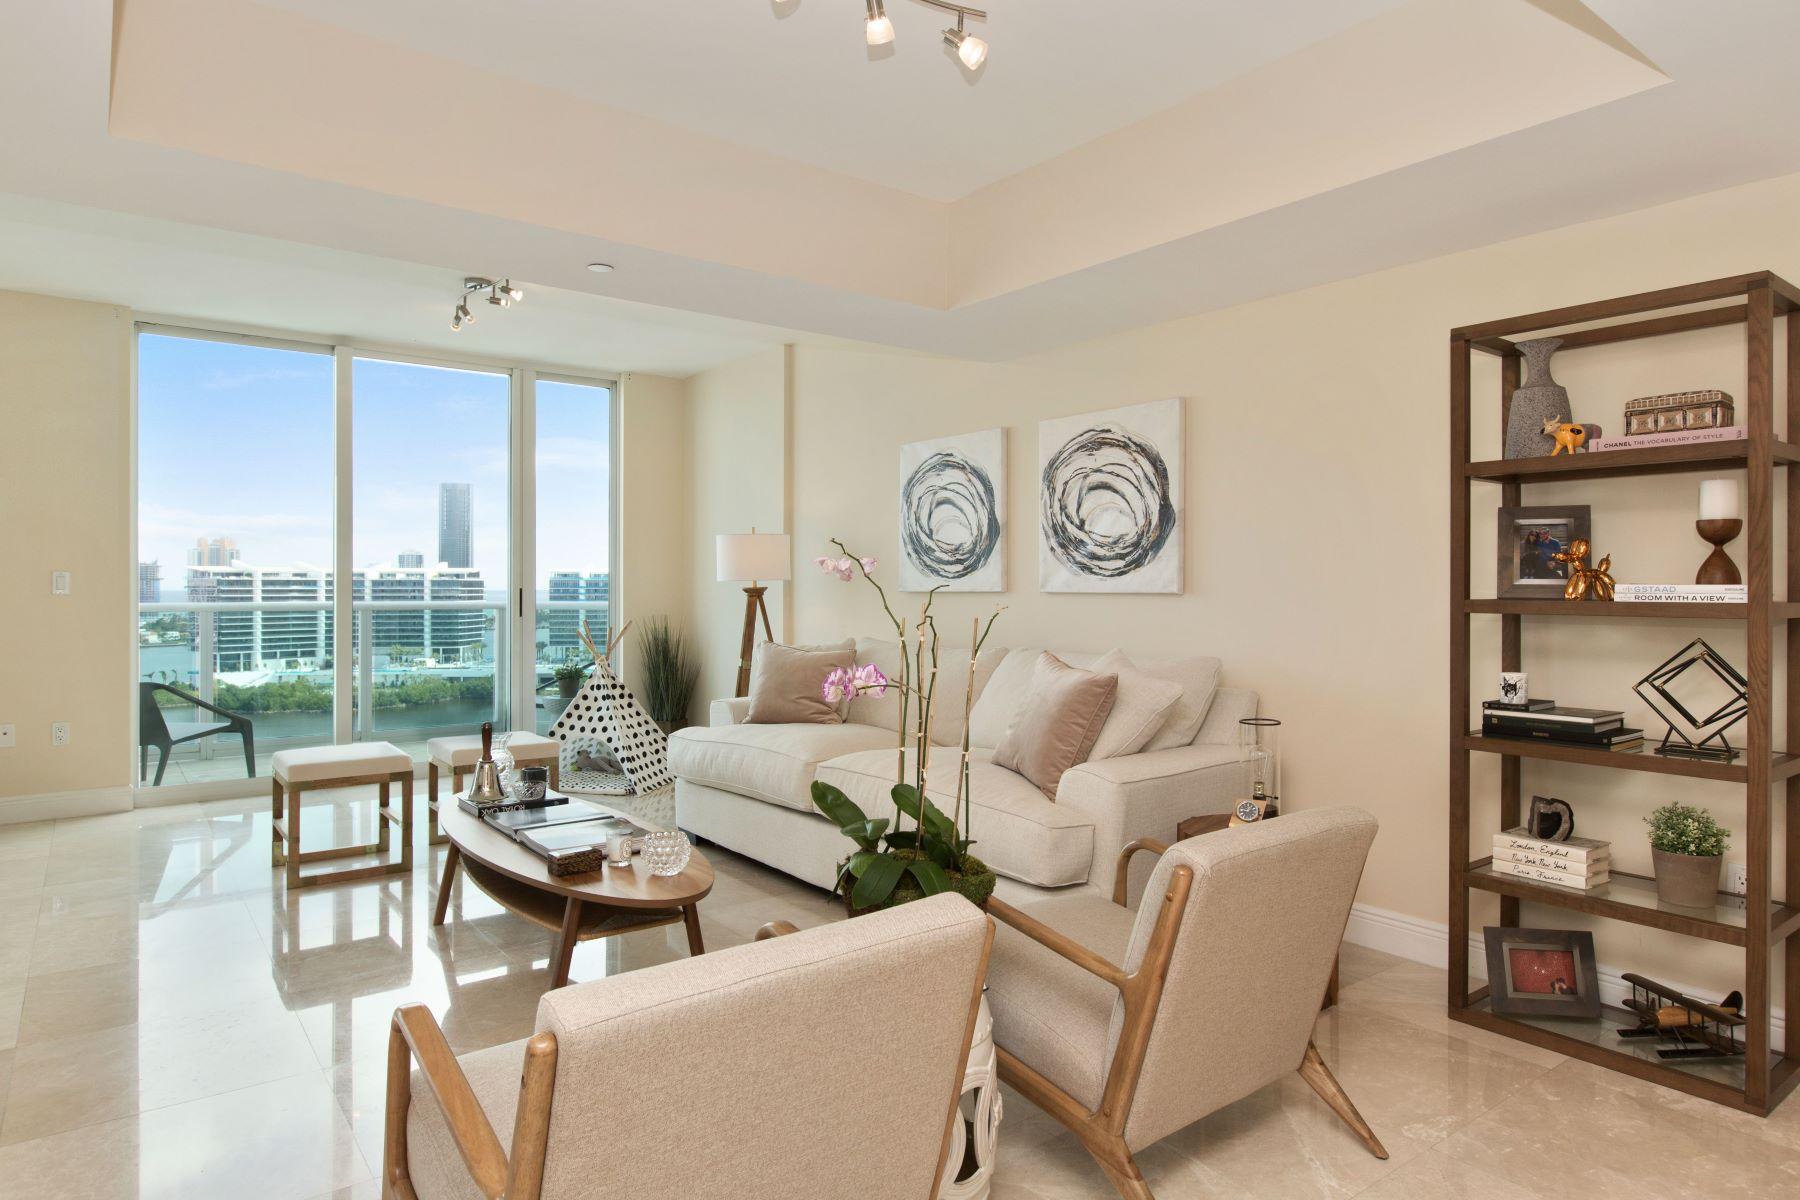 Condominium for Sale at 3301 Ne 183rd St 3301 Ne 183rd St 1802, Aventura, Florida, 33160 United States